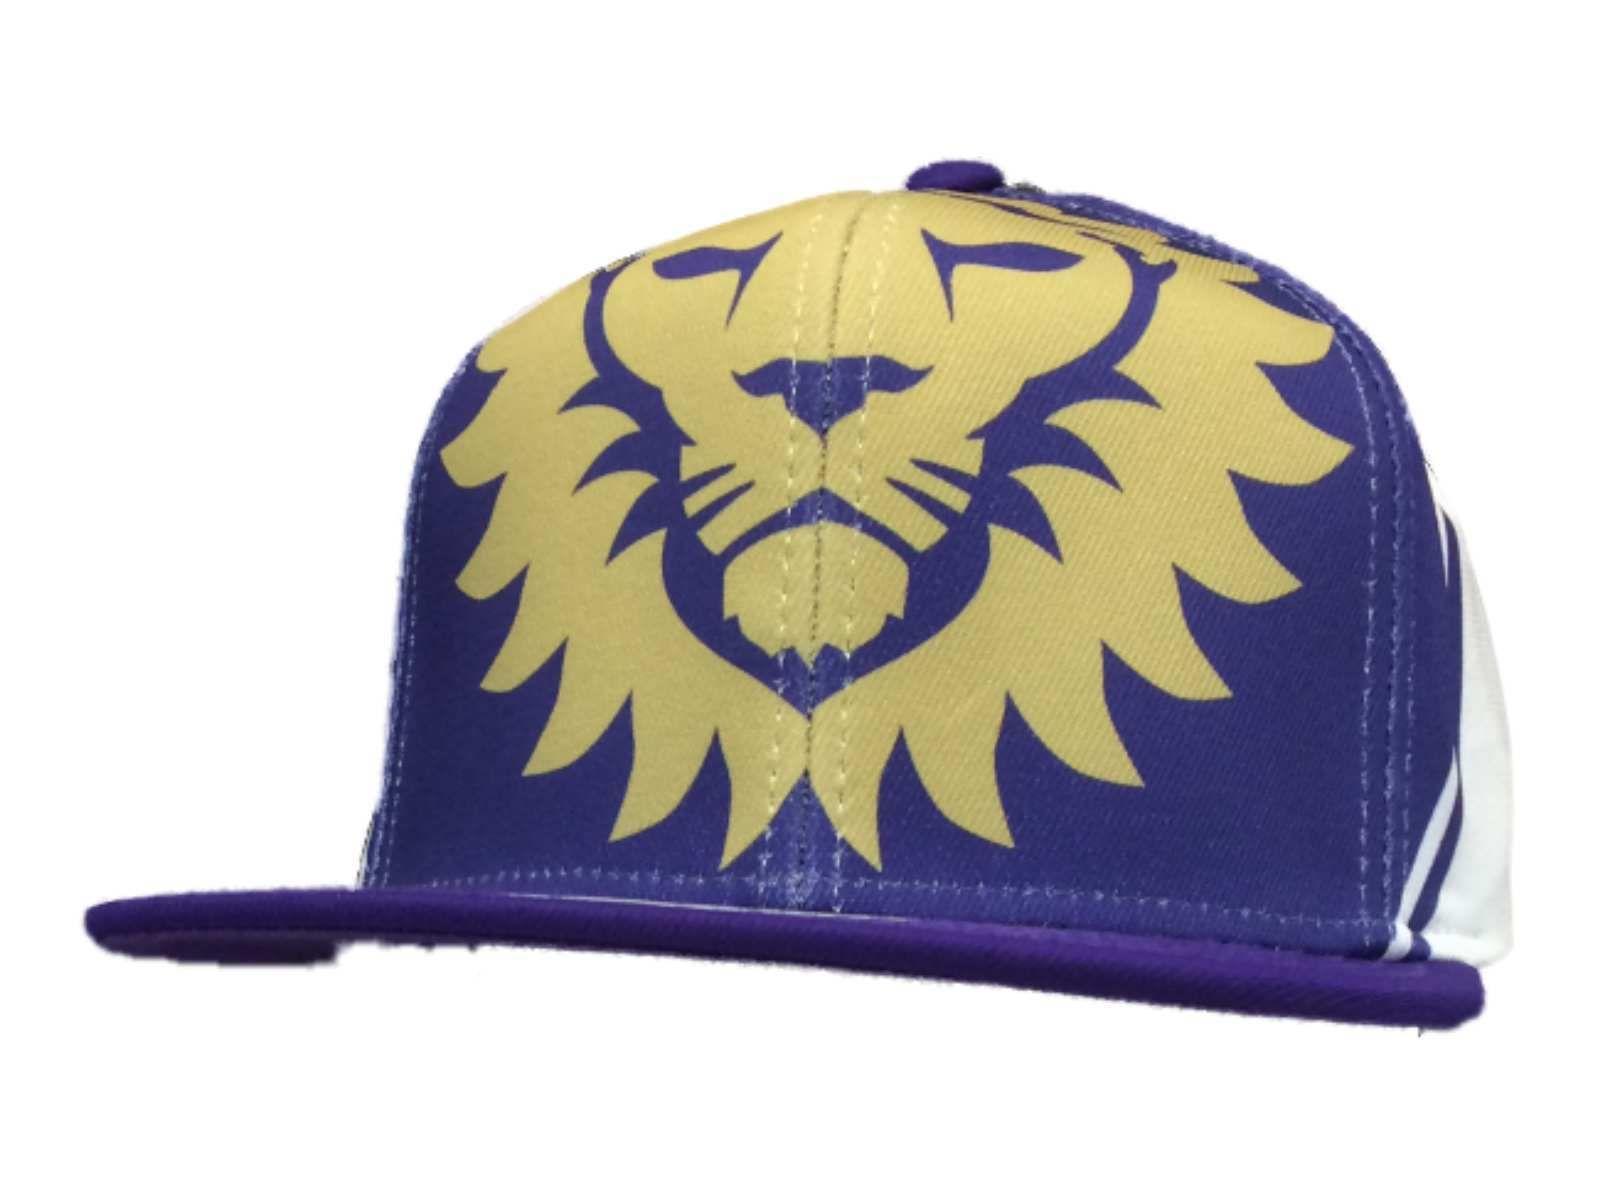 48df5d0e48e Orlando City SC Adidas Purple Large Logo Structured Snapback Flat Bill Hat  Cap in Sports Mem